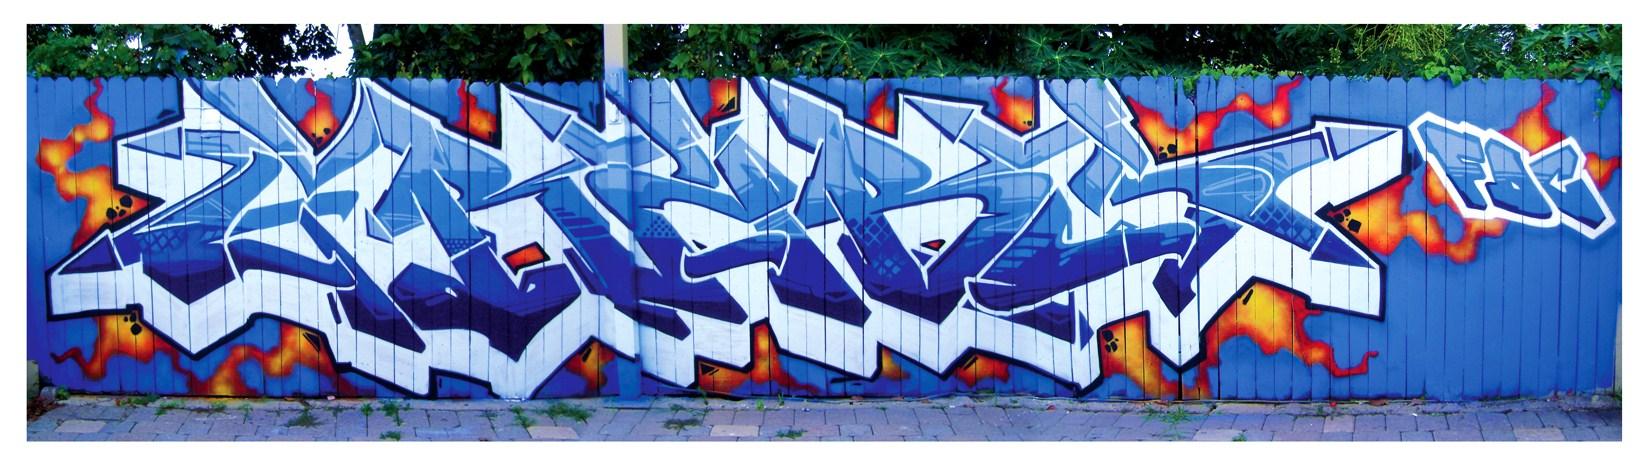 afarm7.static.flickr.com_6198_6039093275_2a5efb799d_o.jpg